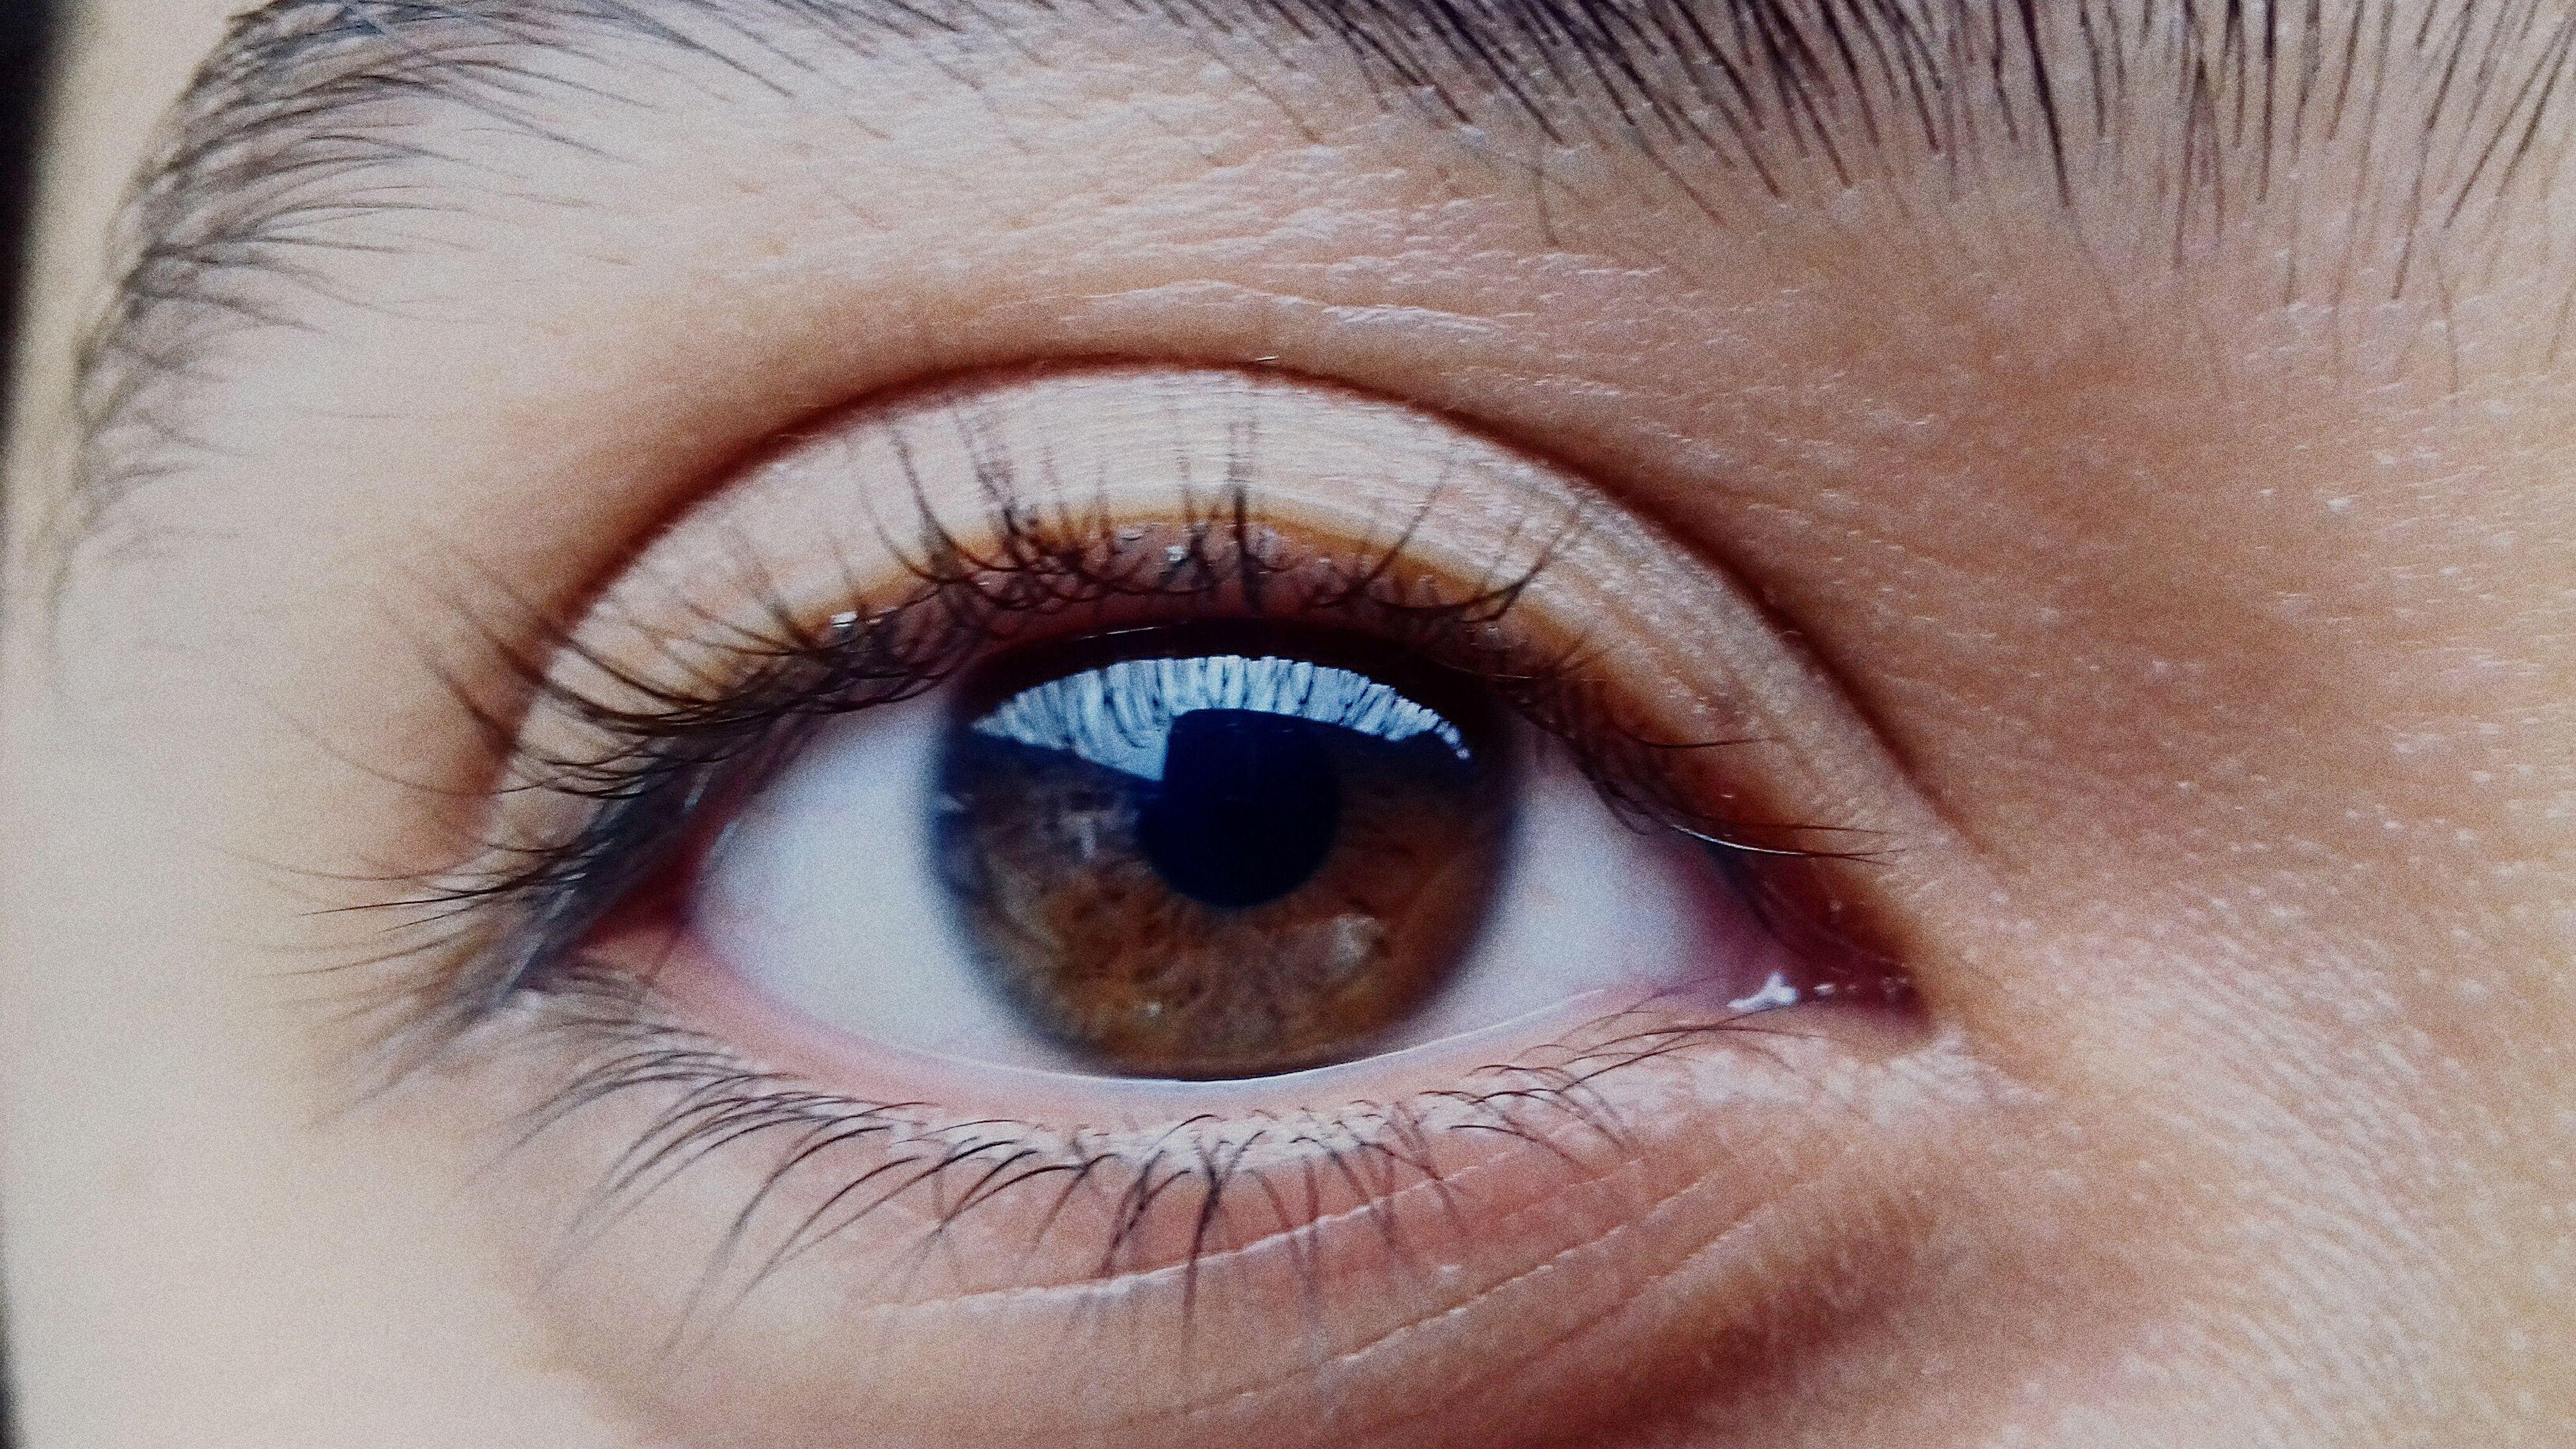 human eye, eyelash, close-up, human body part, eyeball, macro, full frame, sensory perception, iris - eye, eyesight, real people, one person, human skin, eyebrow, outdoors, people, day